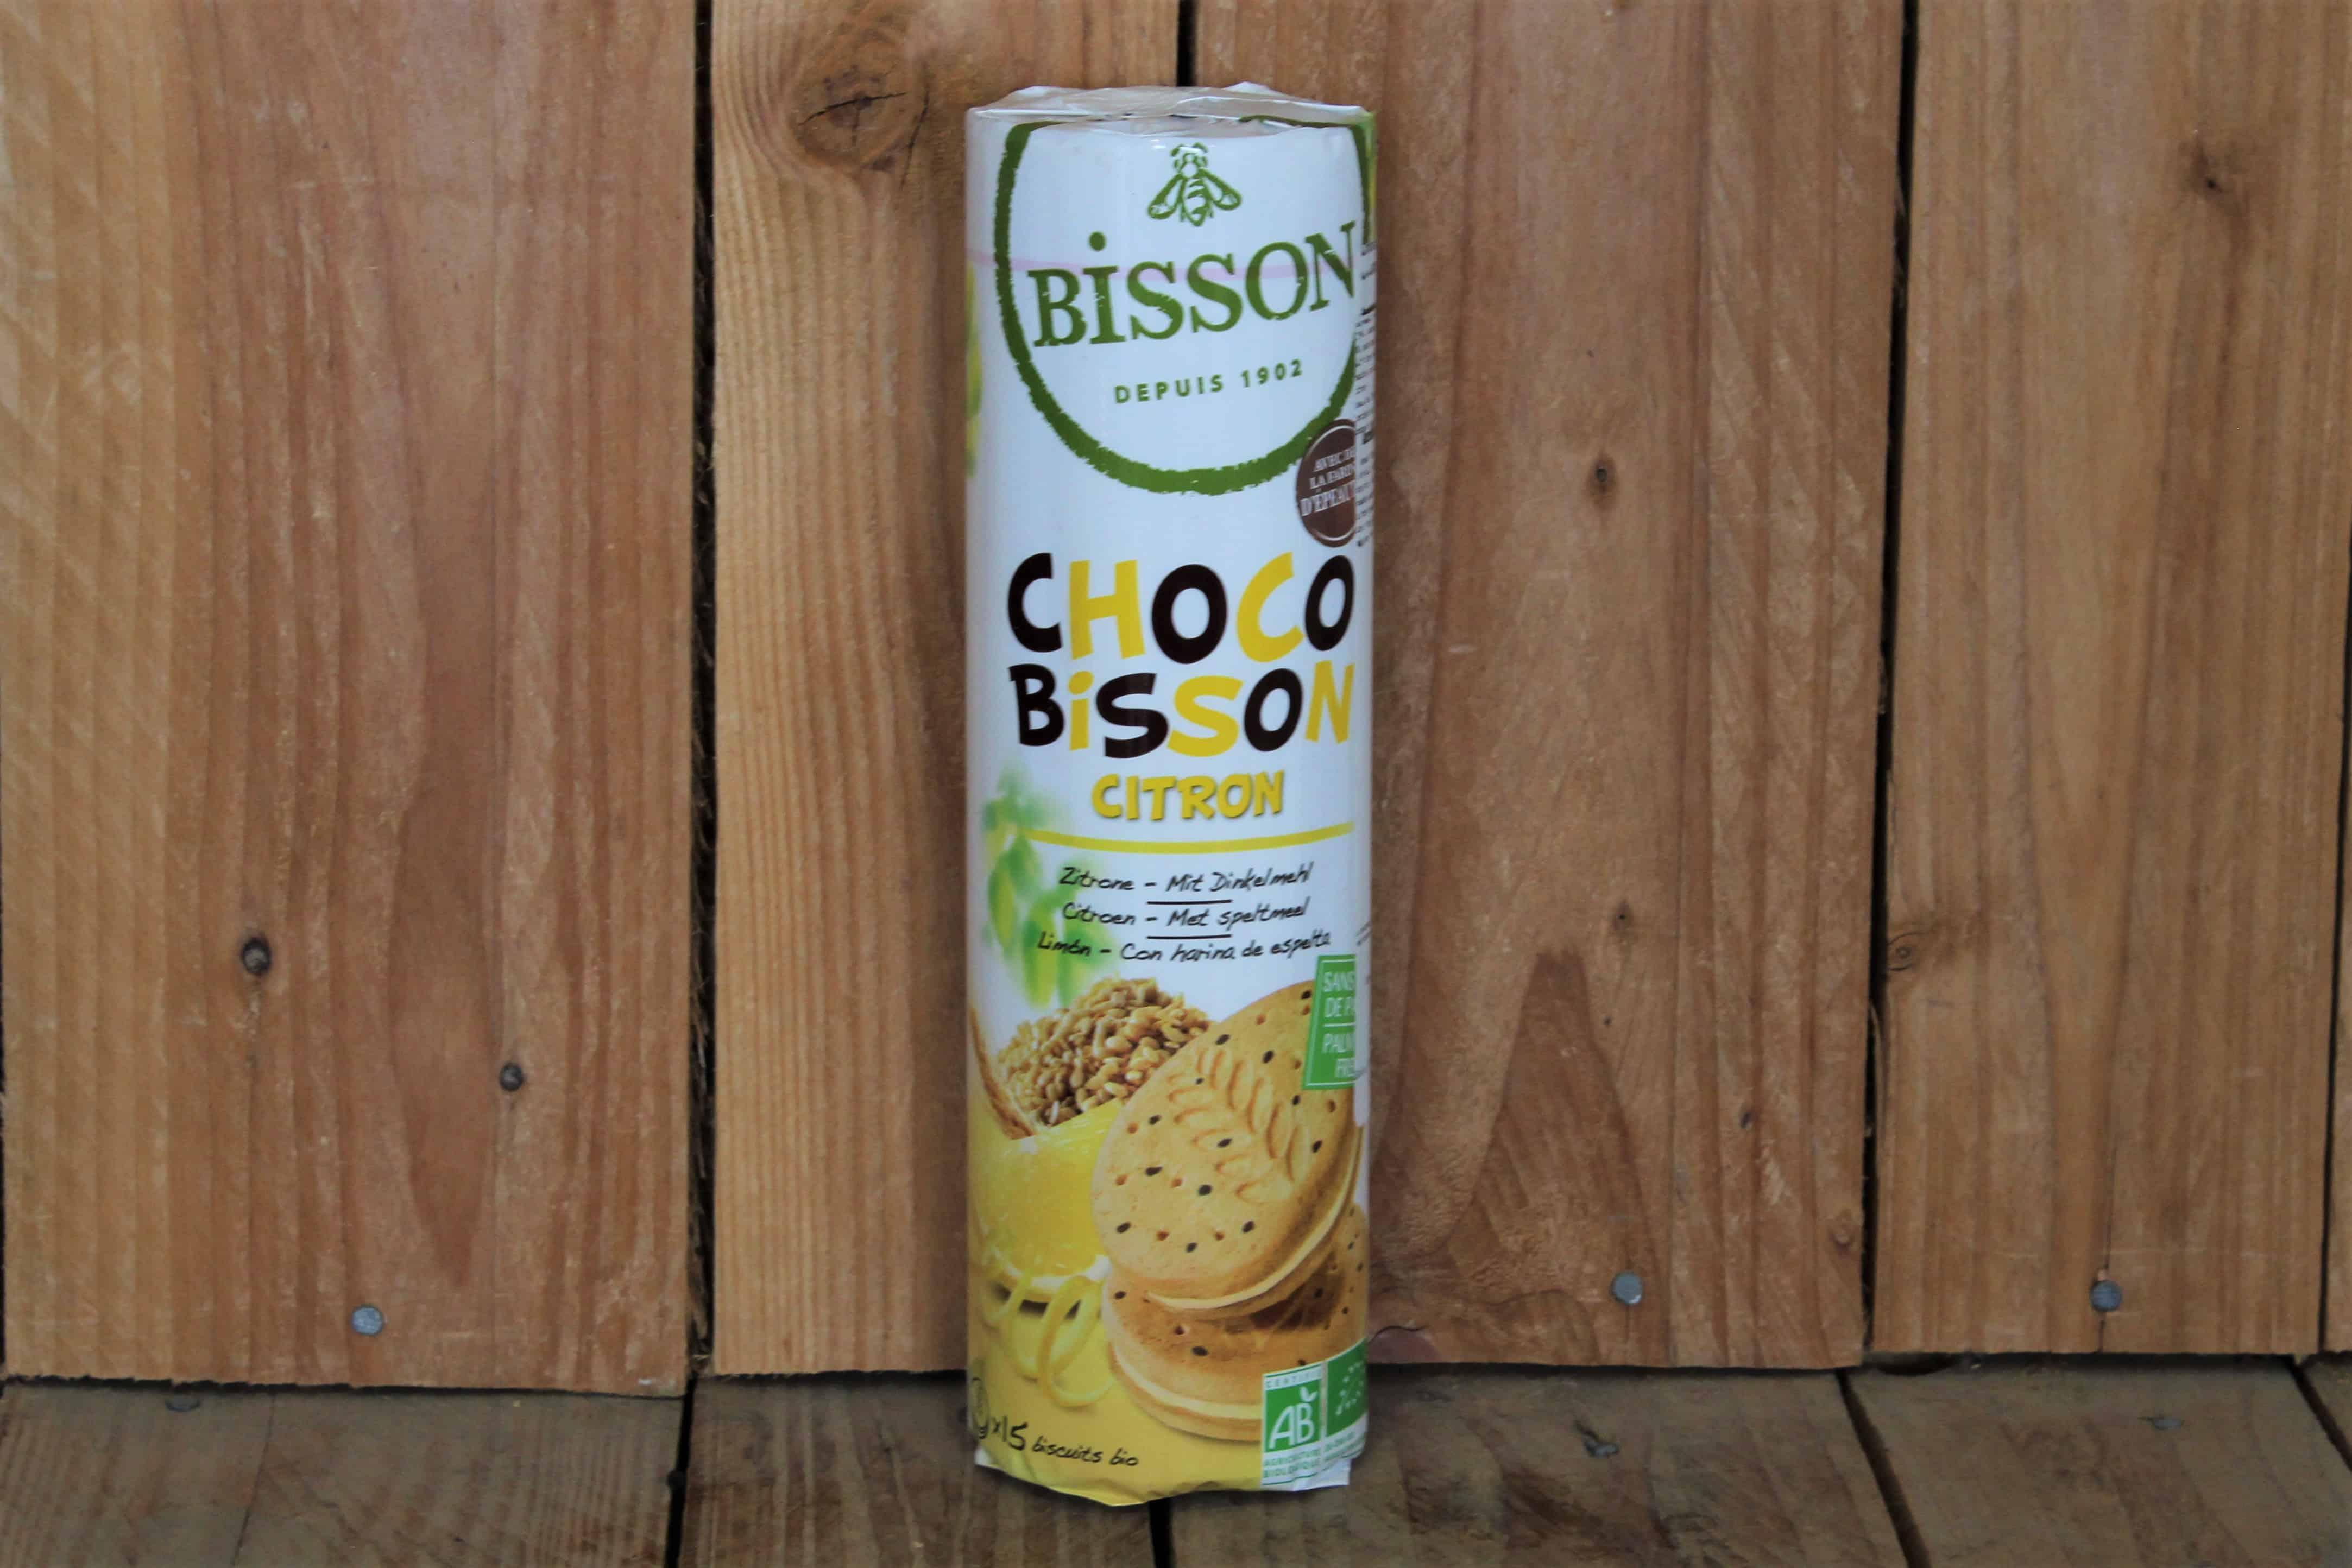 Bisson – Choco Bisson Cacao Lemon (300g)